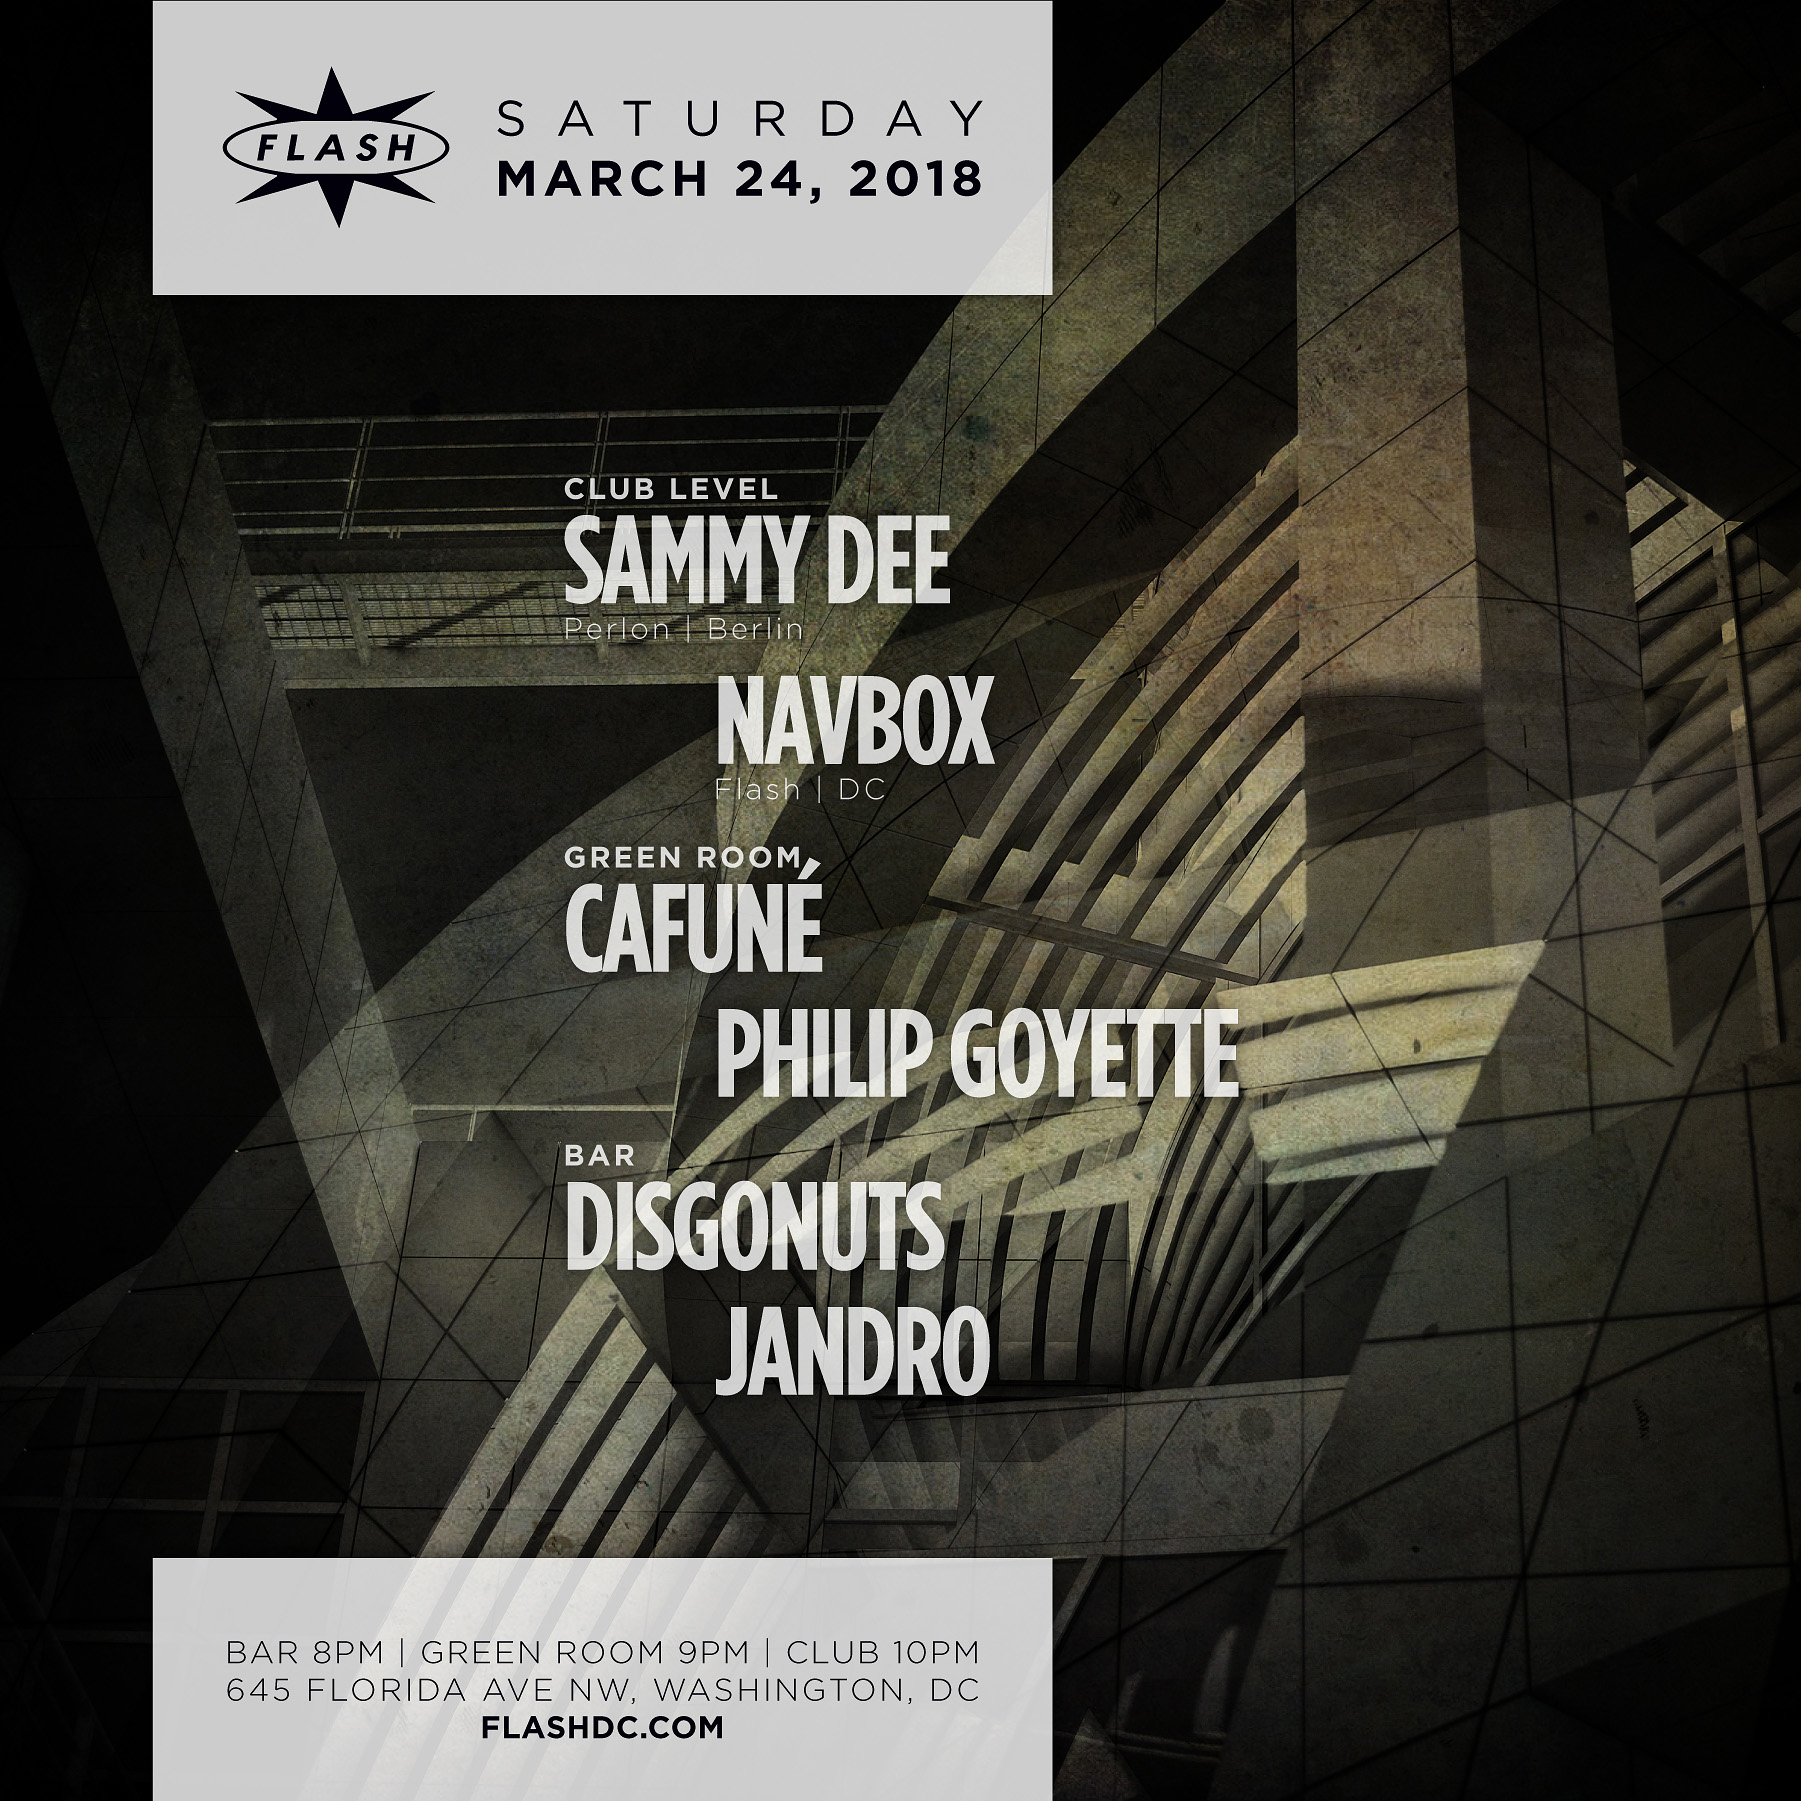 Sammy Dee - Navbox event thumbnail